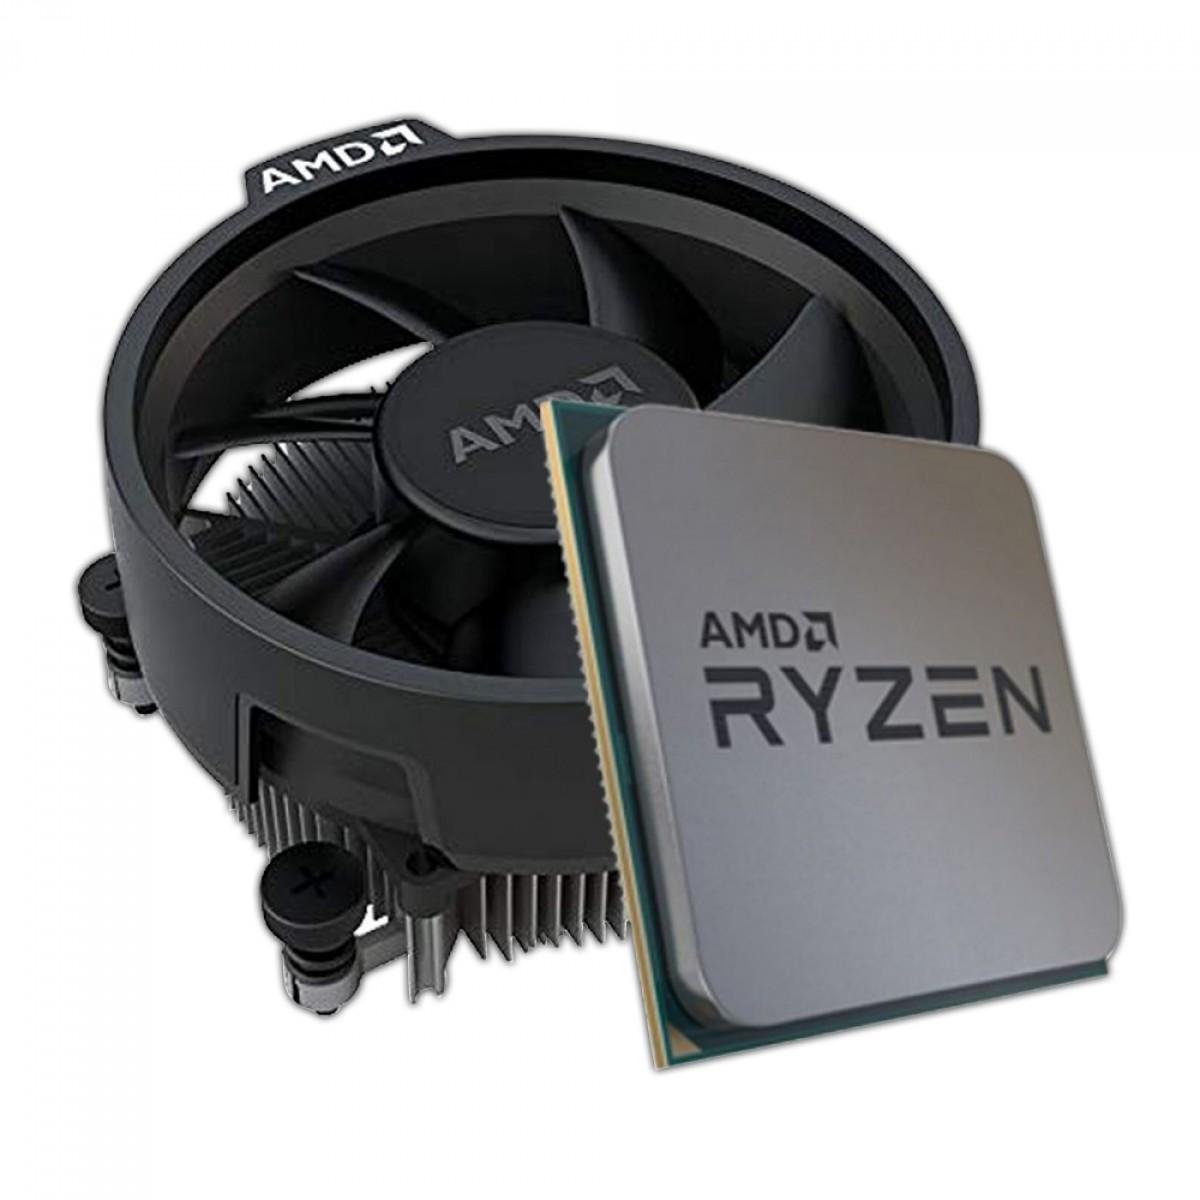 Kit Upgrade, AMD Ryzen 5 3400G, Asrock A320M-HD, Memória DDR4 8GB 3000MHz